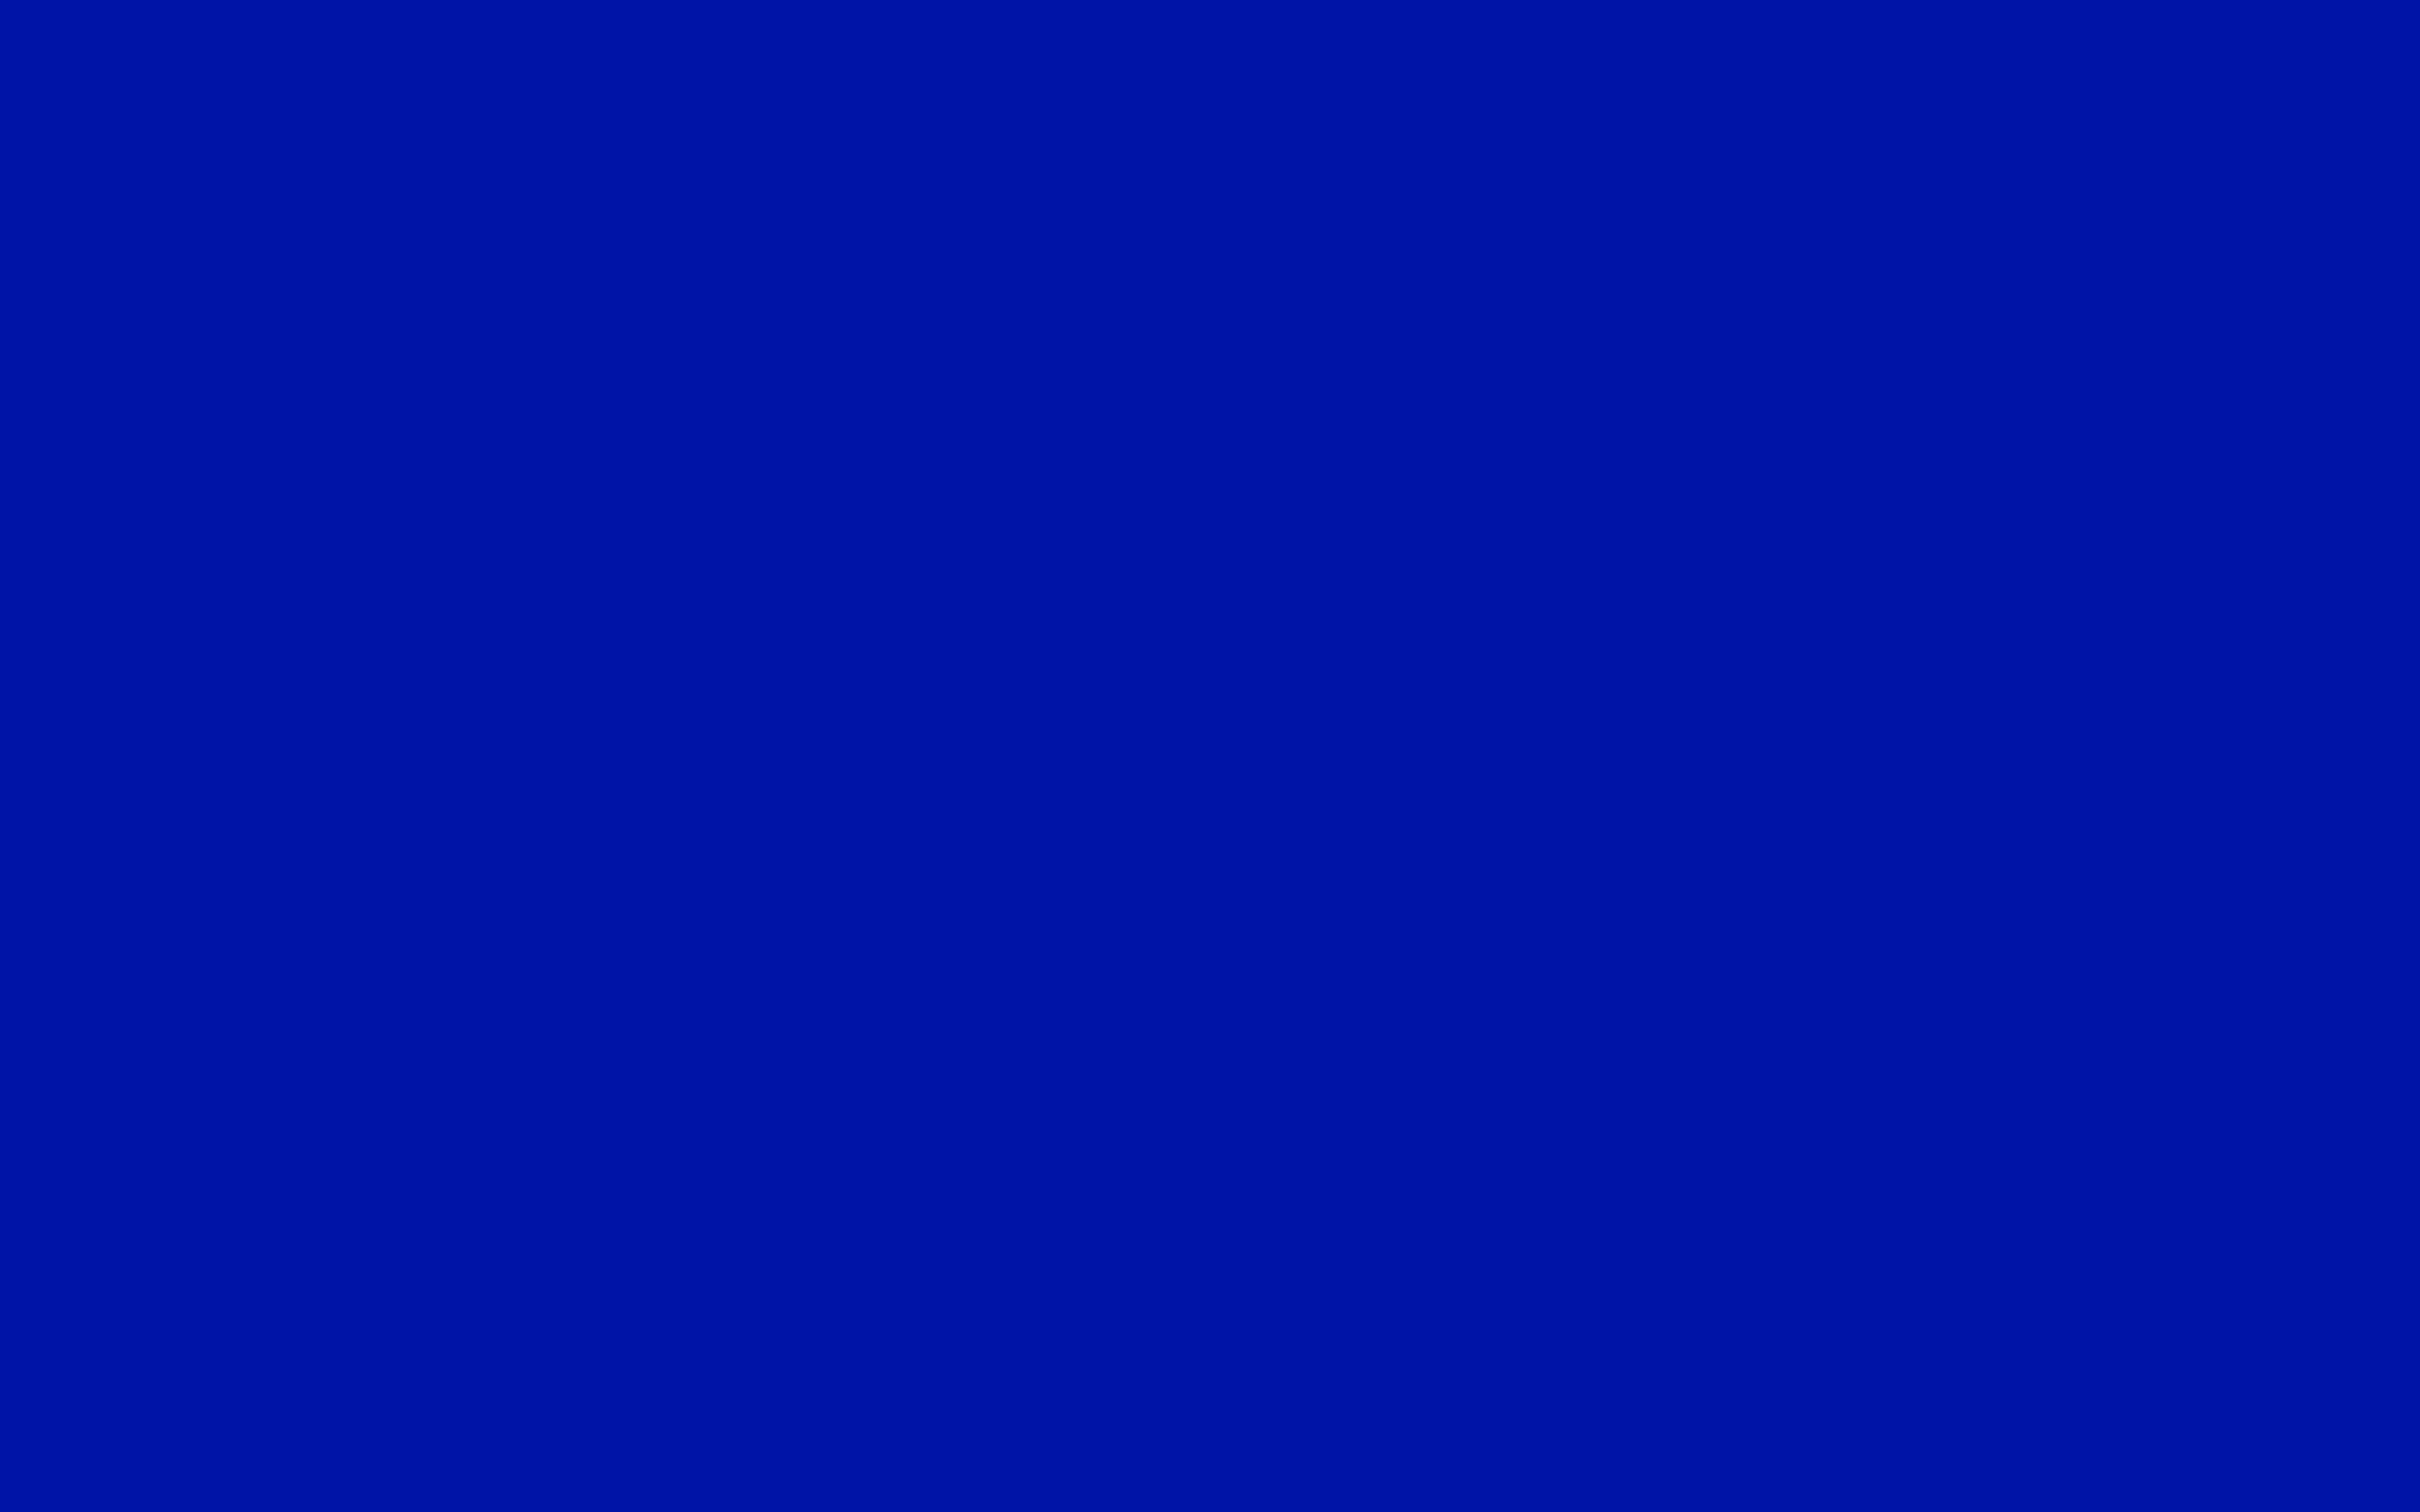 2560x1600 Zaffre Solid Color Background